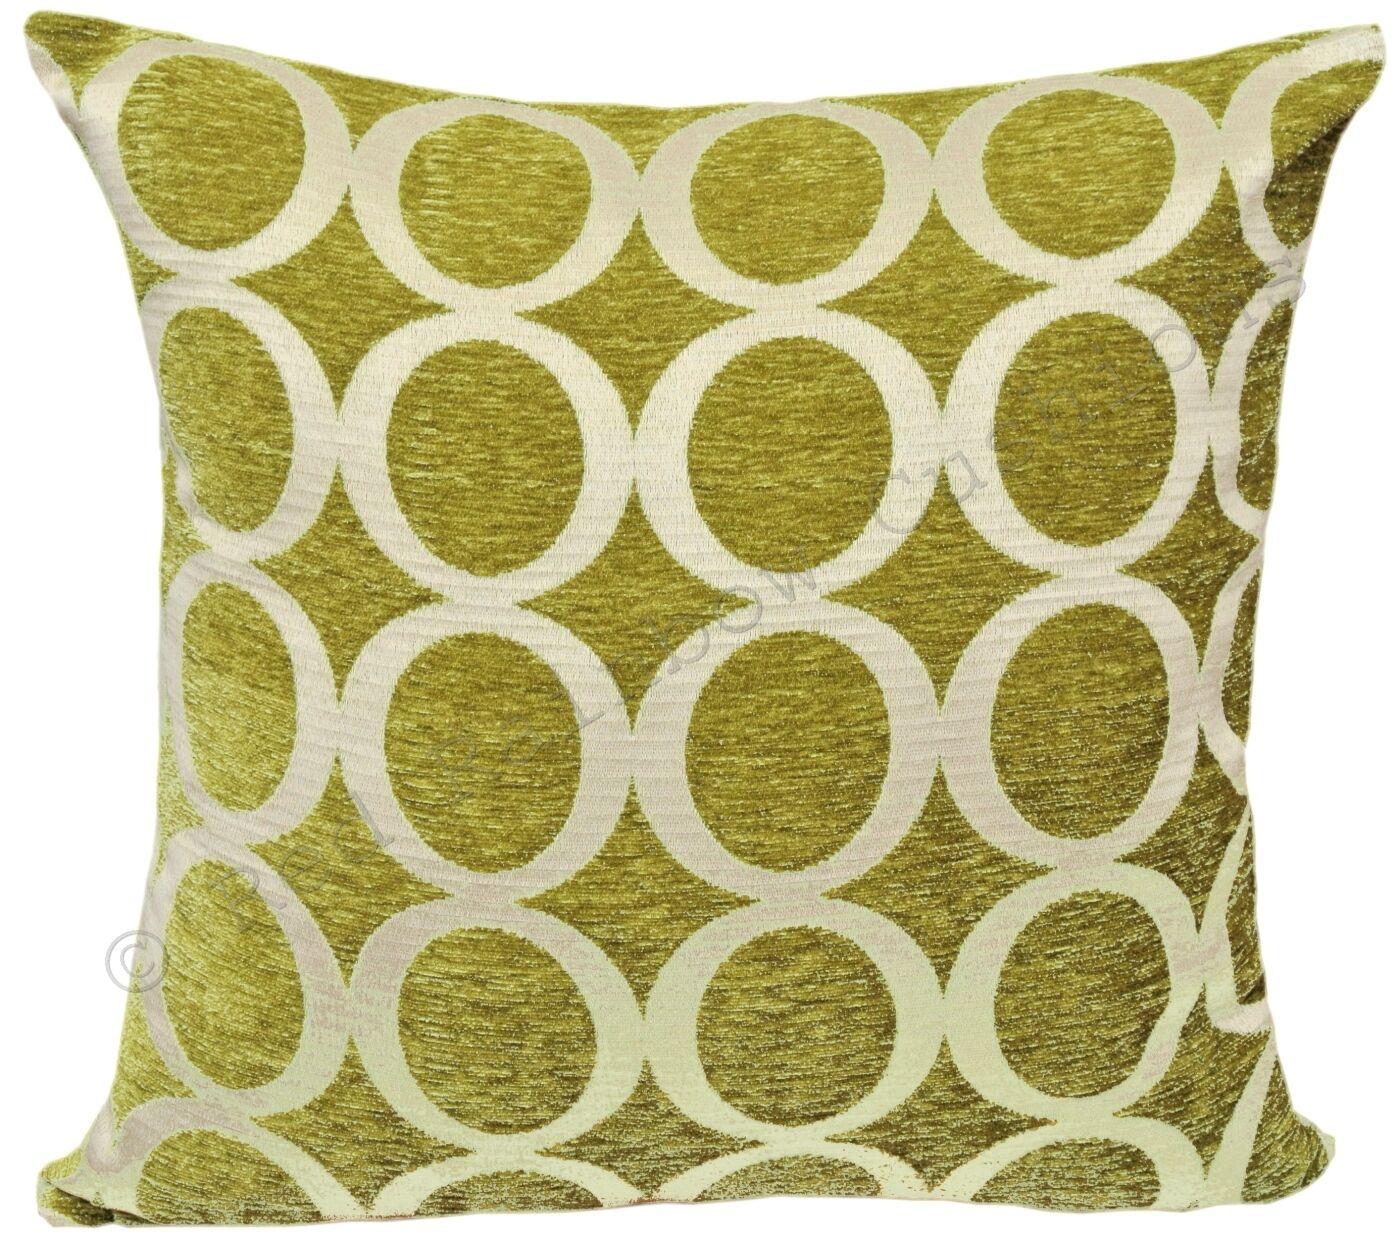 "Lime Green & Cream 18"" Luxury Soft Chenille Cushion Cover Oh BNWT"